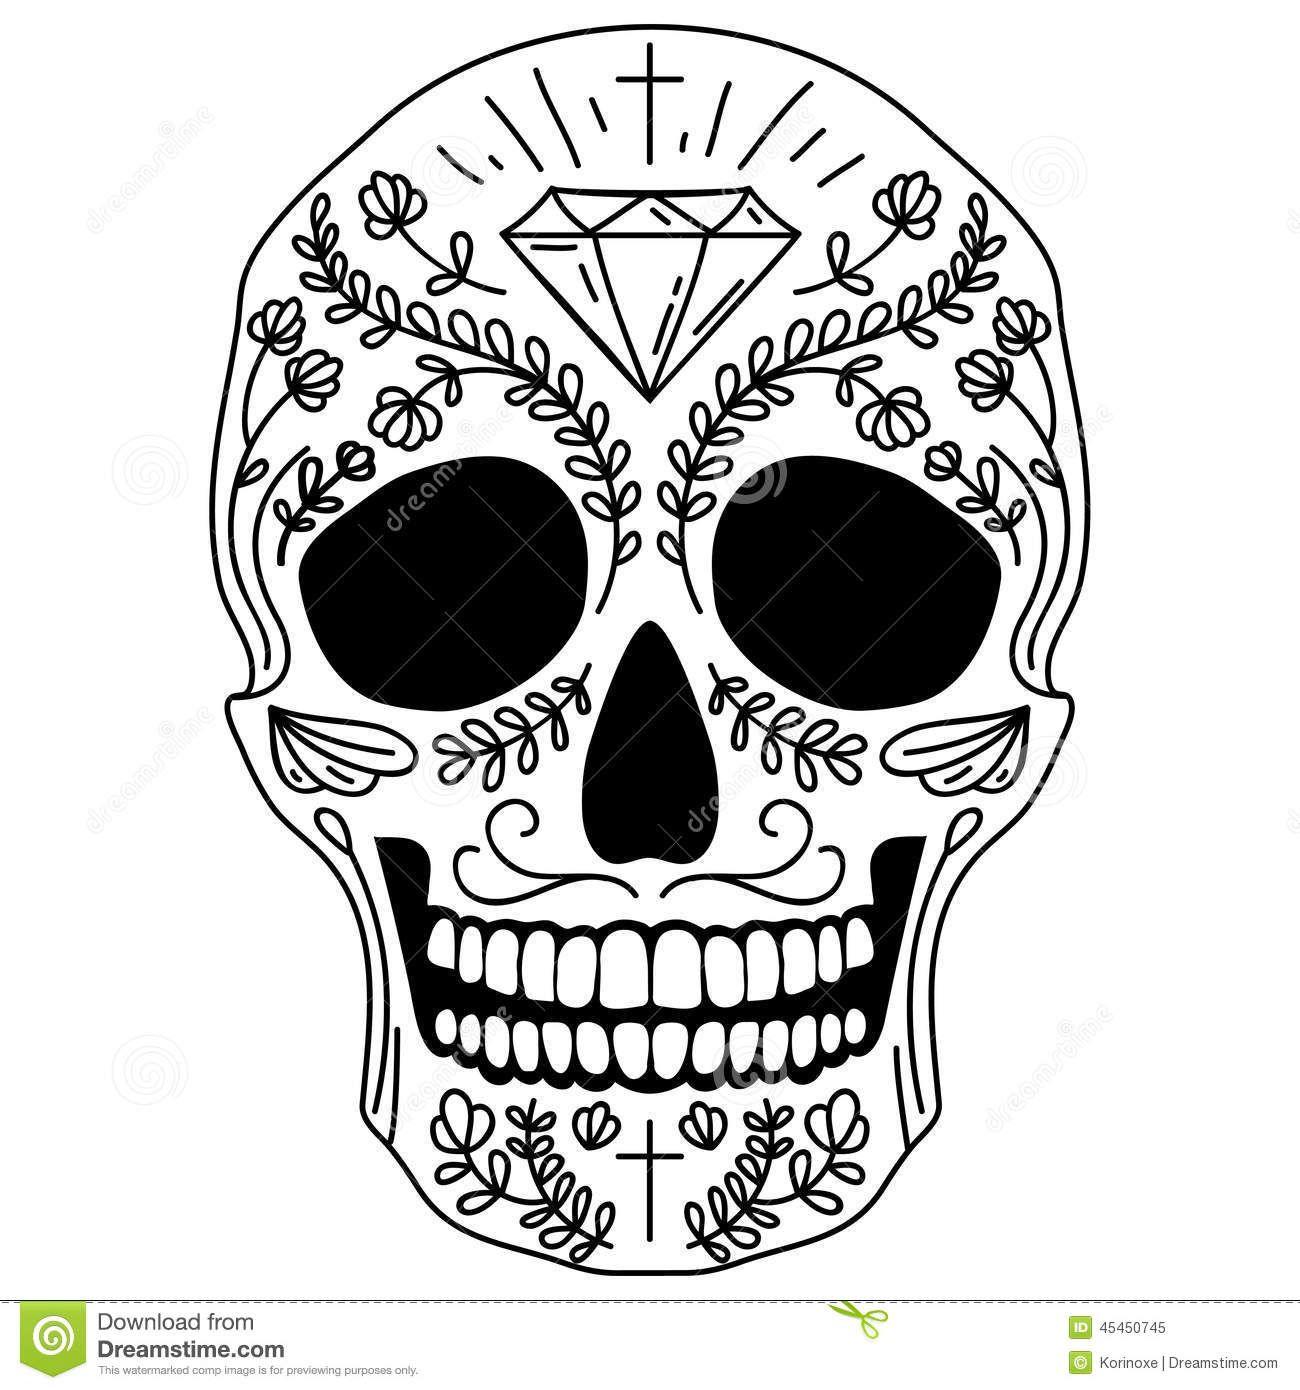 print very simple sugar skull skull coloring pages anatomy - Simple Sugar Skull Coloring Pages